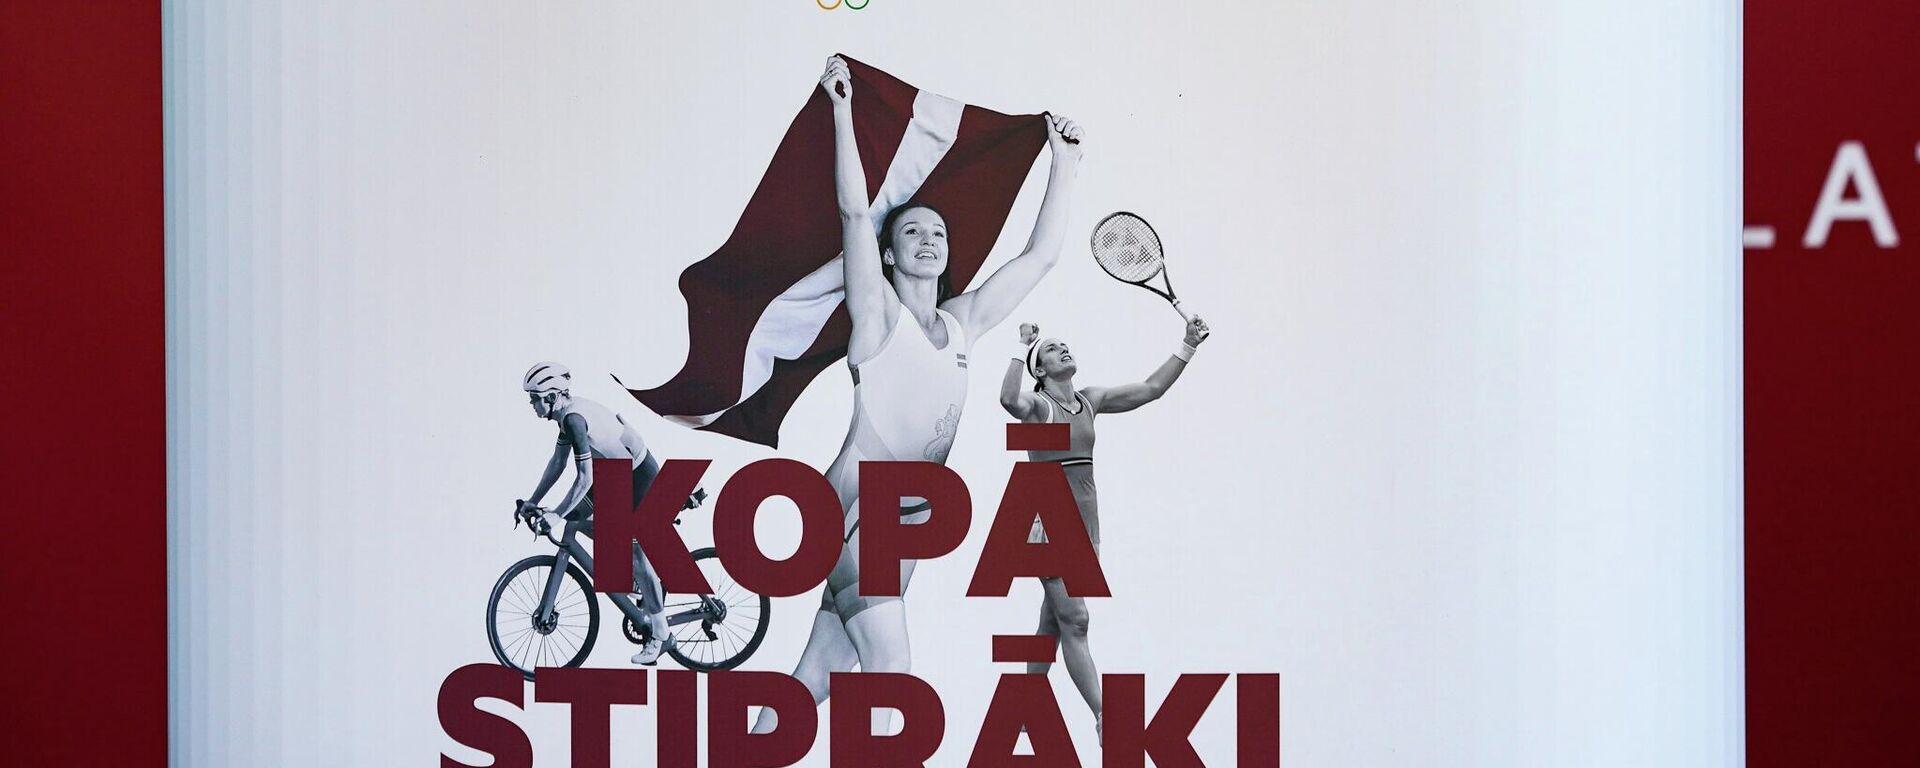 Плакат Латвийского олимпийского комитета в поддержку команды на Олимпиаде в Токио - Sputnik Латвия, 1920, 22.07.2021